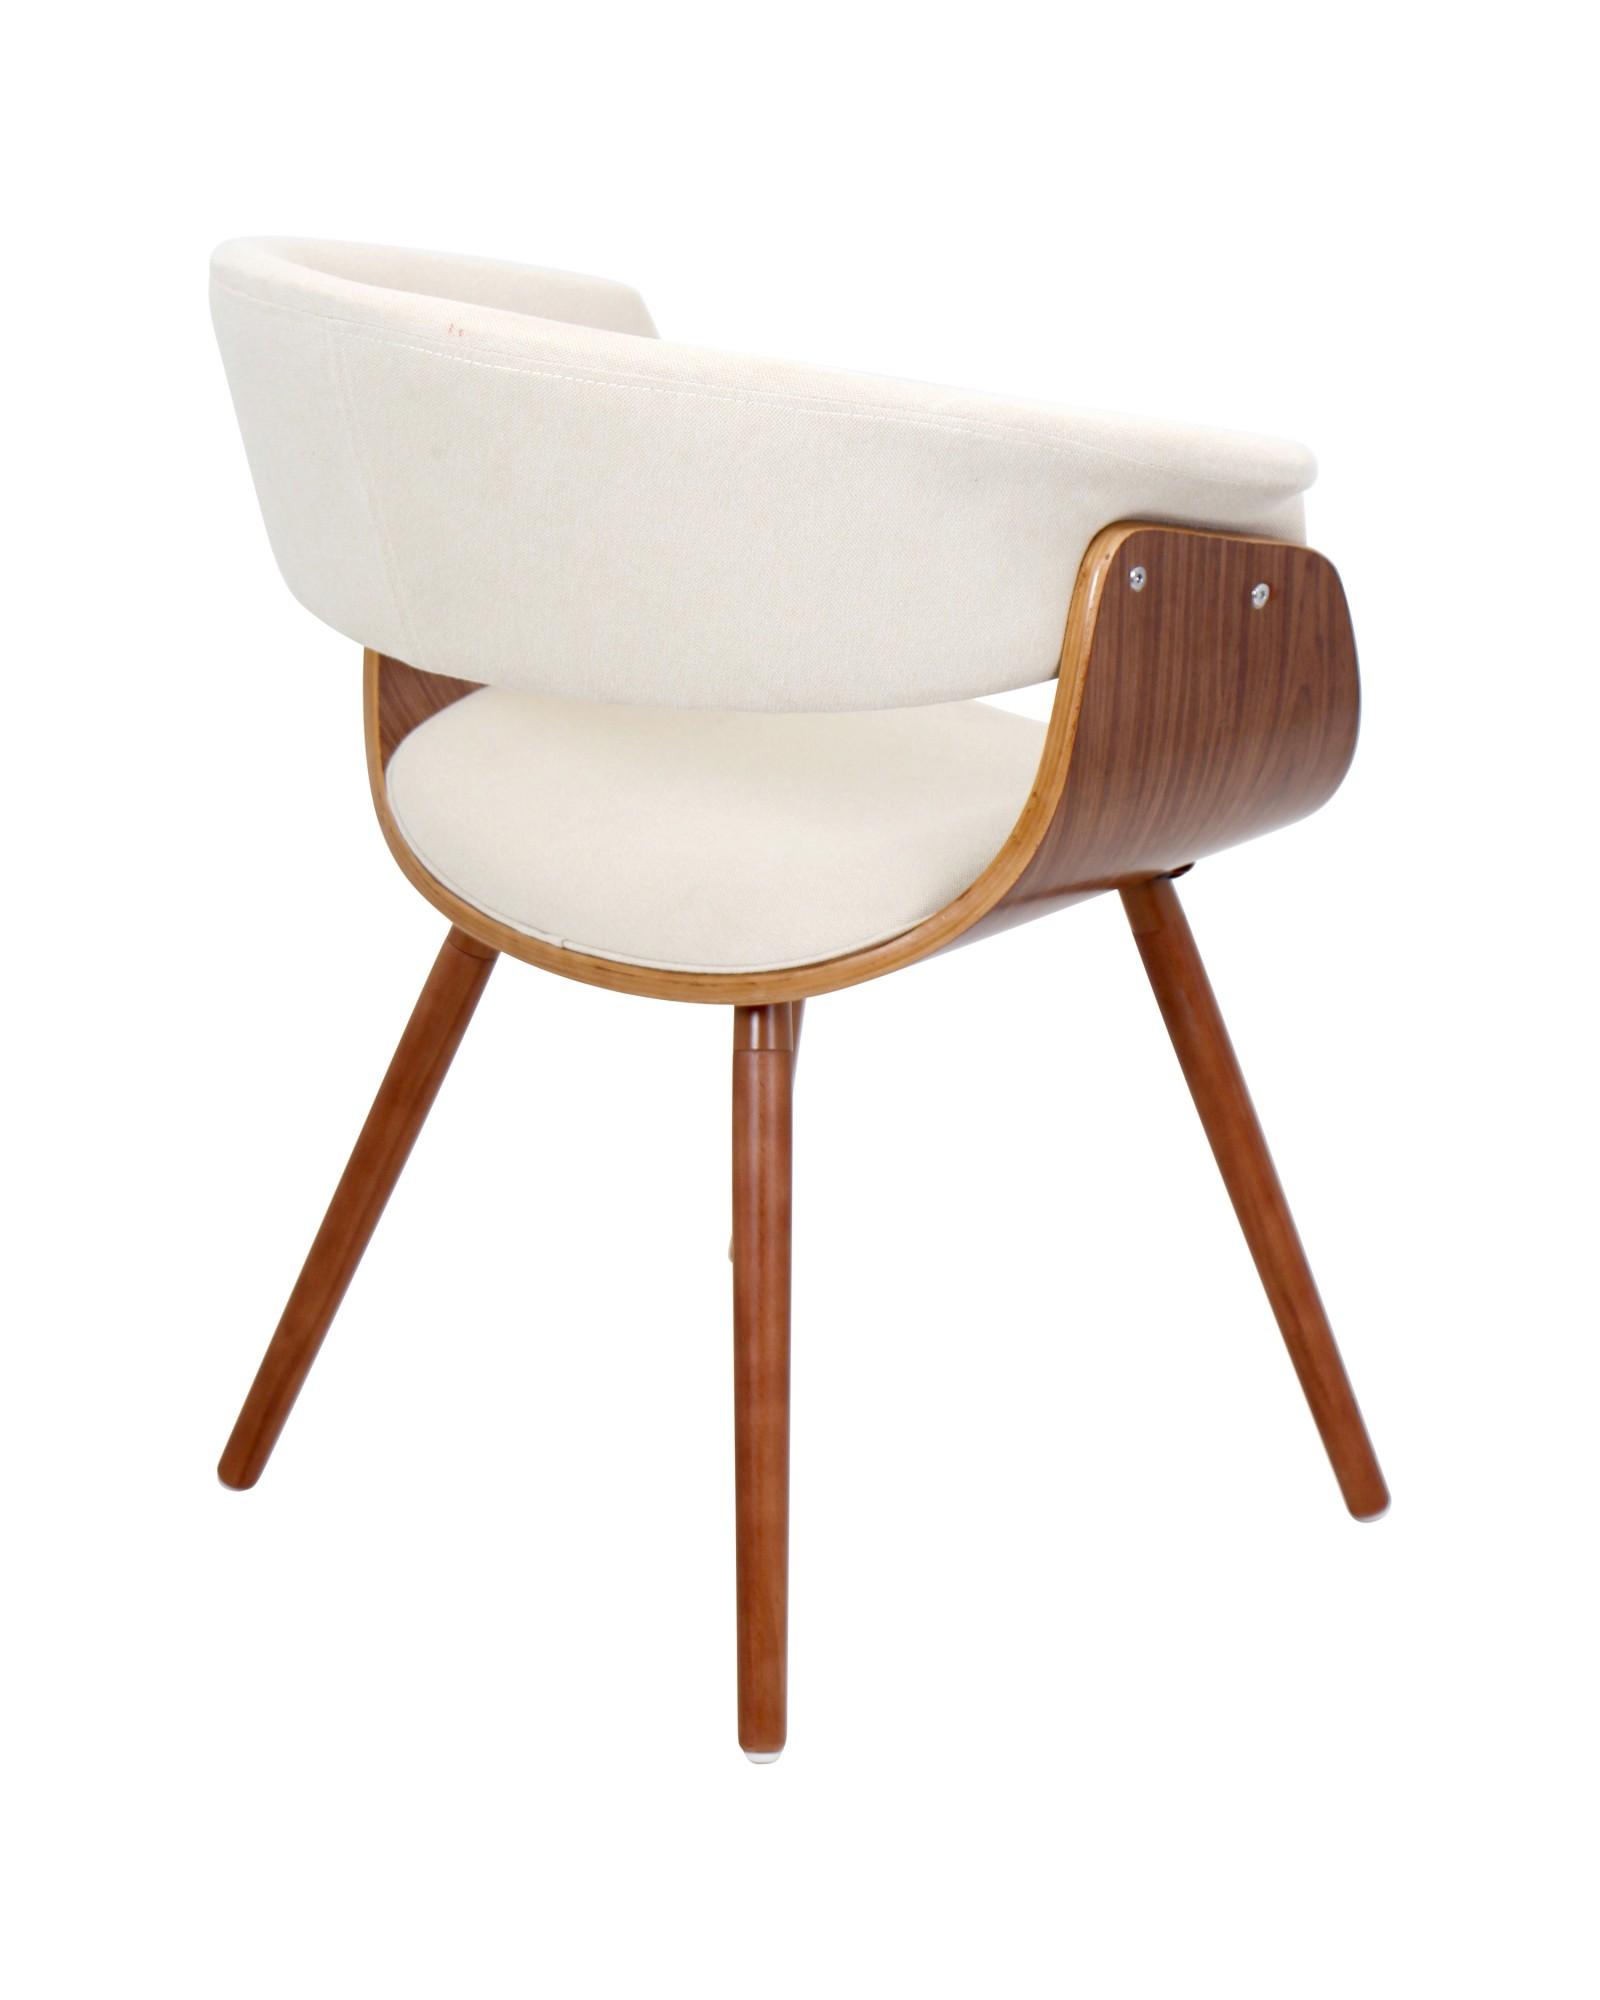 Vintage Mod Mid-Century Modern Chair in Walnut and Cream Fabric